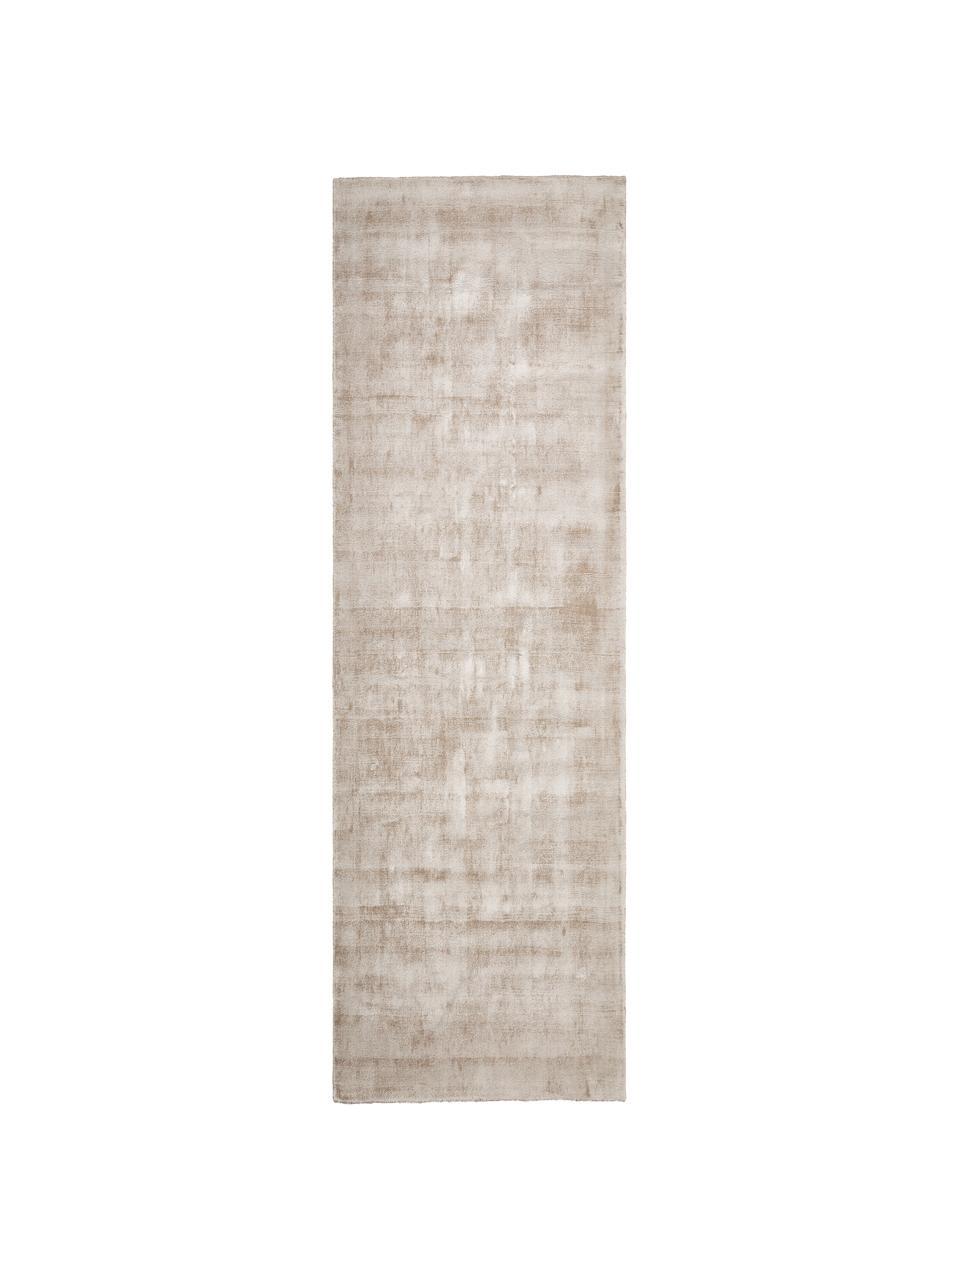 Handgewebter Viskoseläufer Jane in Beige, Flor: 100% Viskose, Beige, 80 x 250 cm